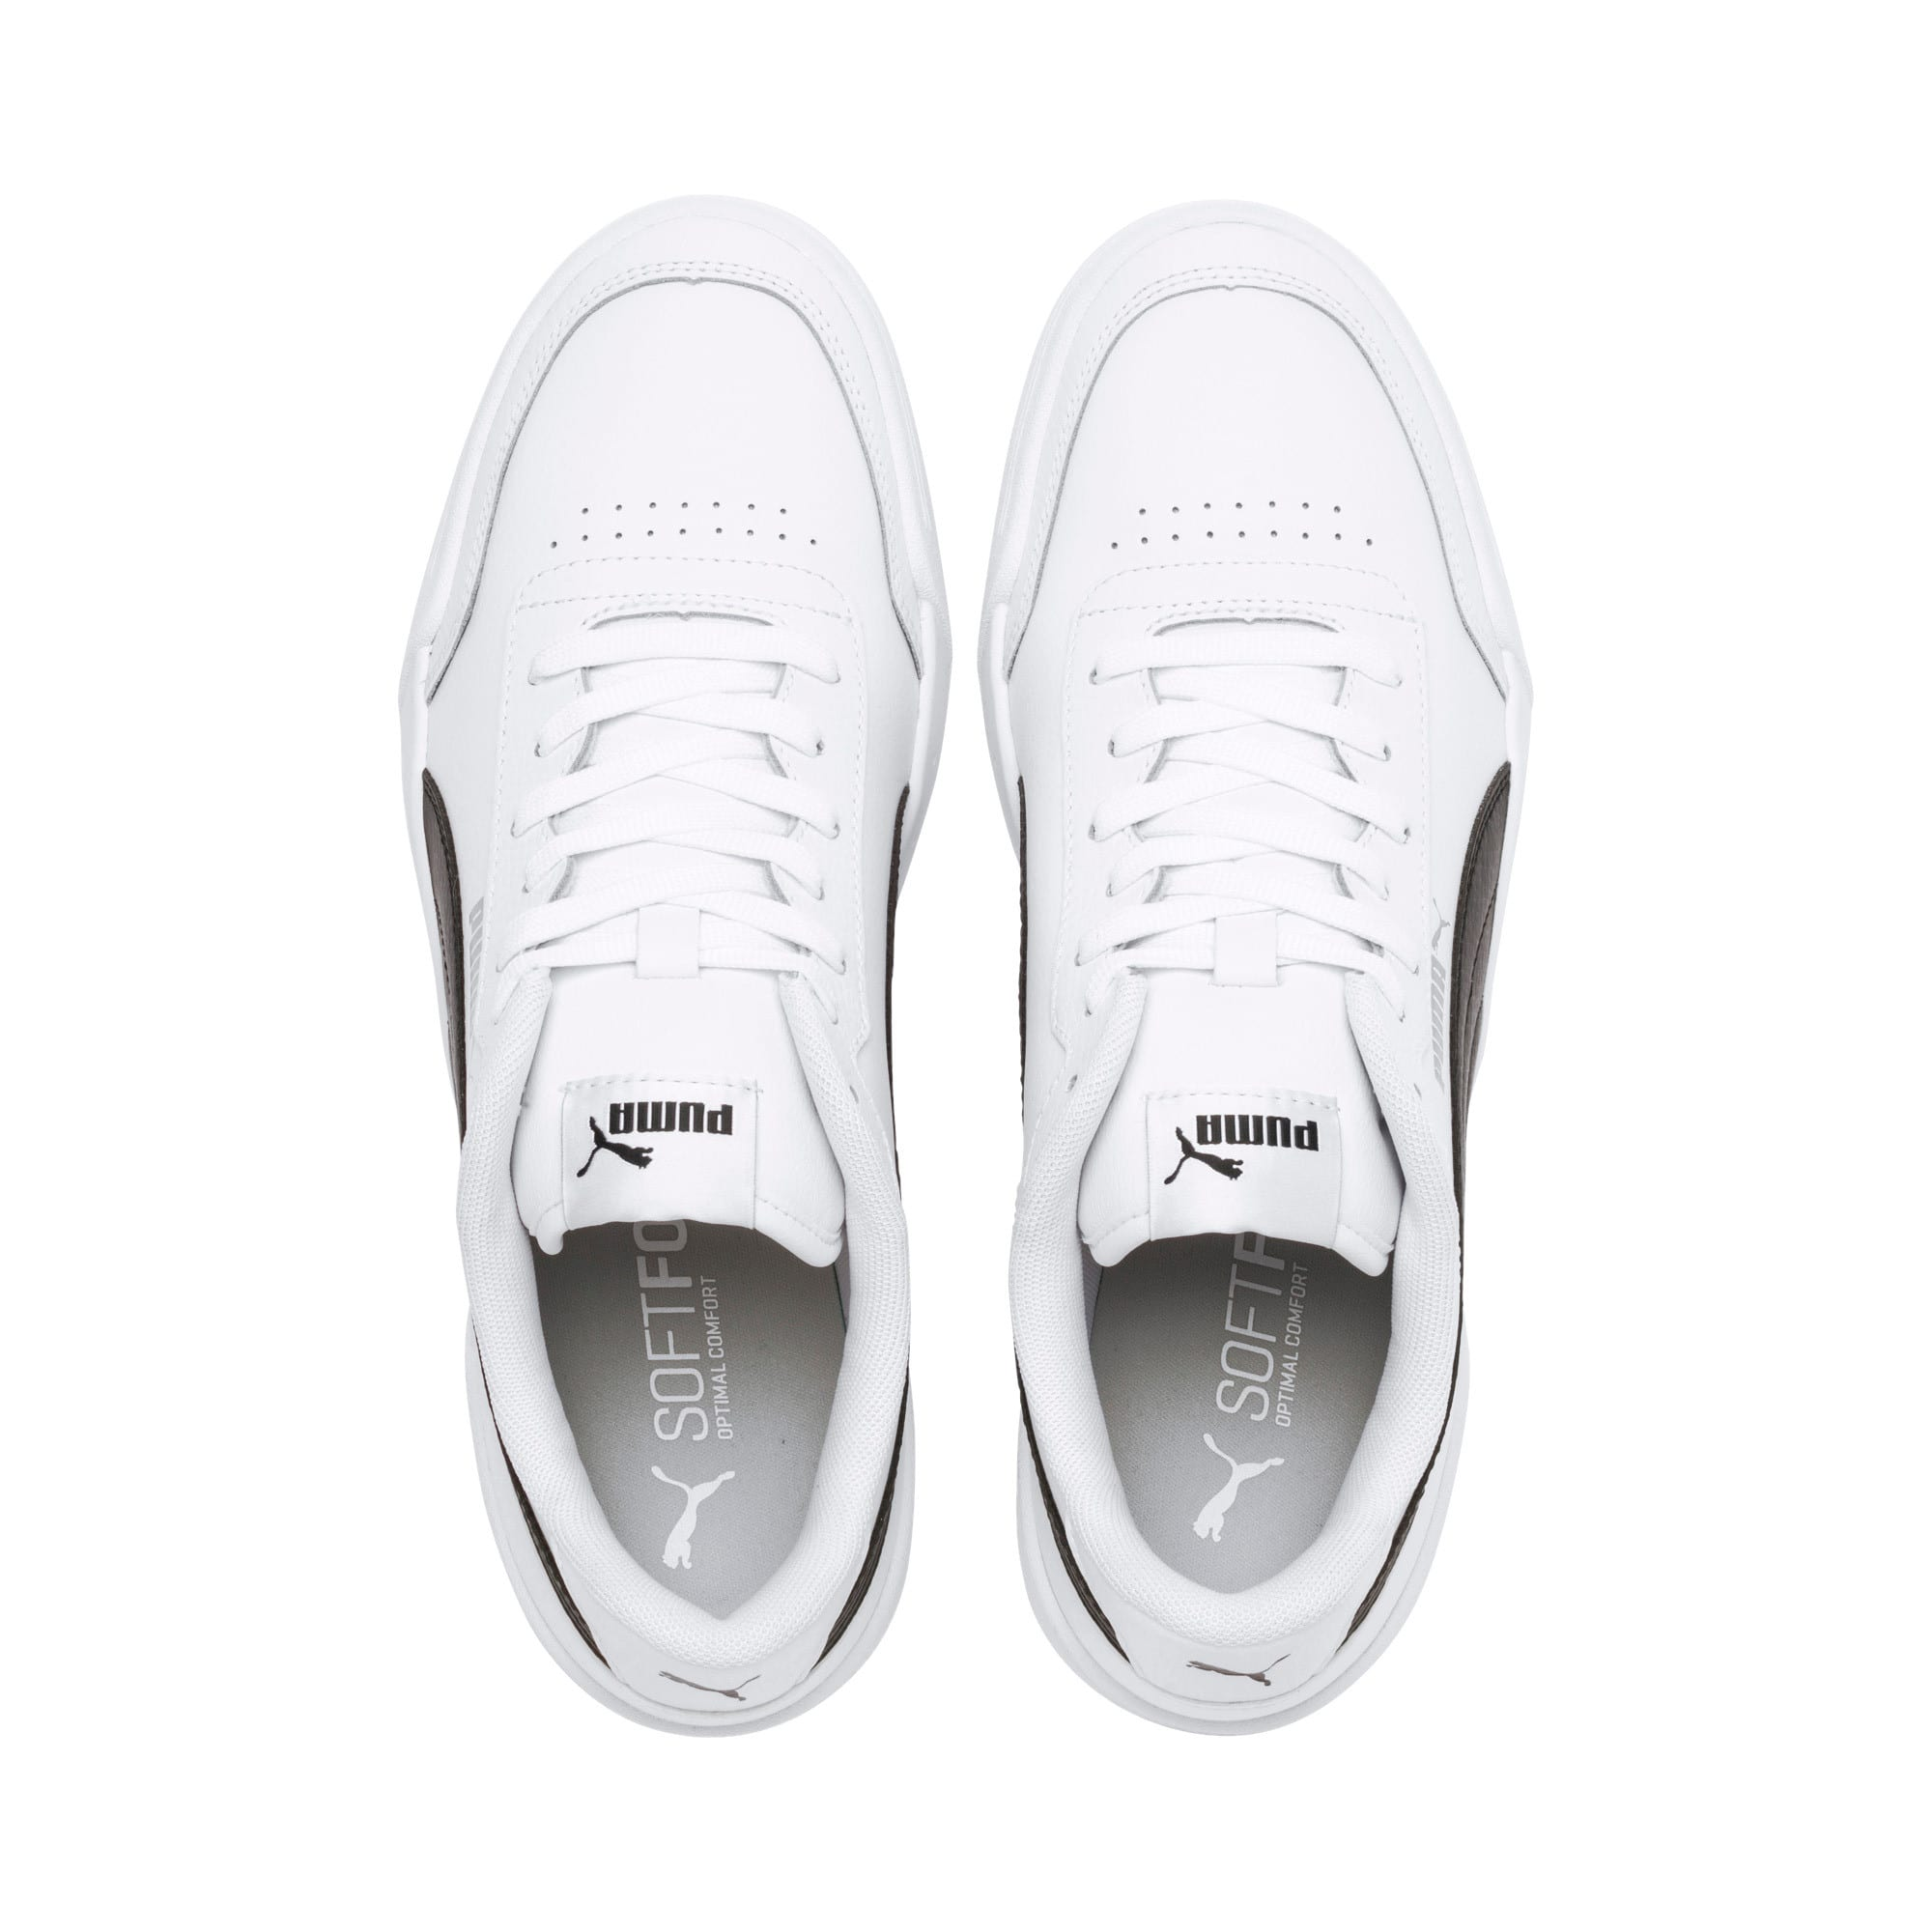 Thumbnail 7 of Caracal Sneakers, Puma White-Puma Black, medium